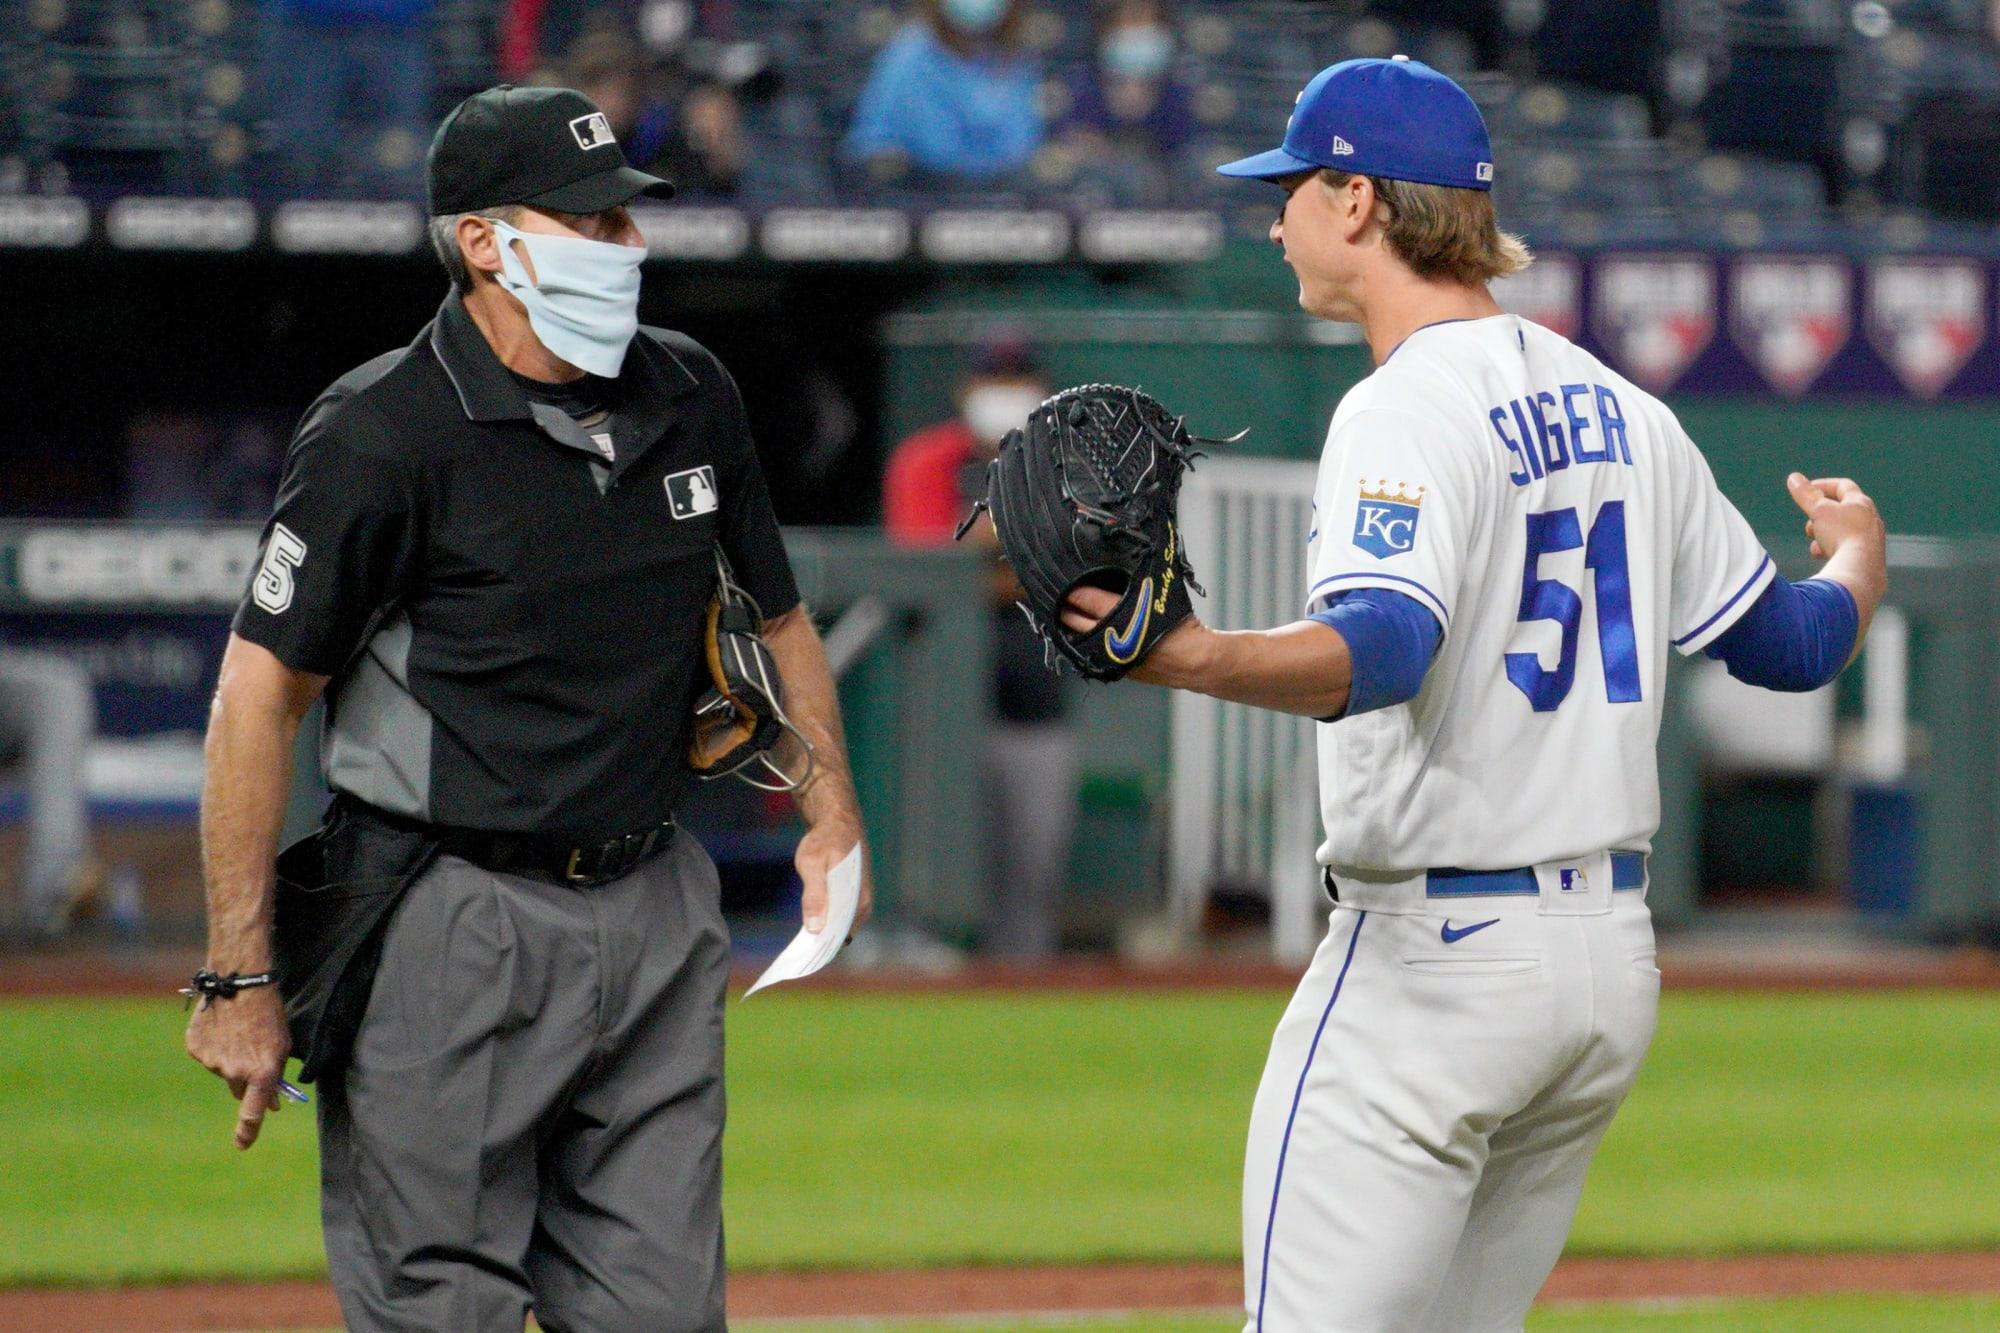 MLB news: Yankees secret sauce revealed, Cubs good, Tony La Russa bad, Angel Hernandez ugly